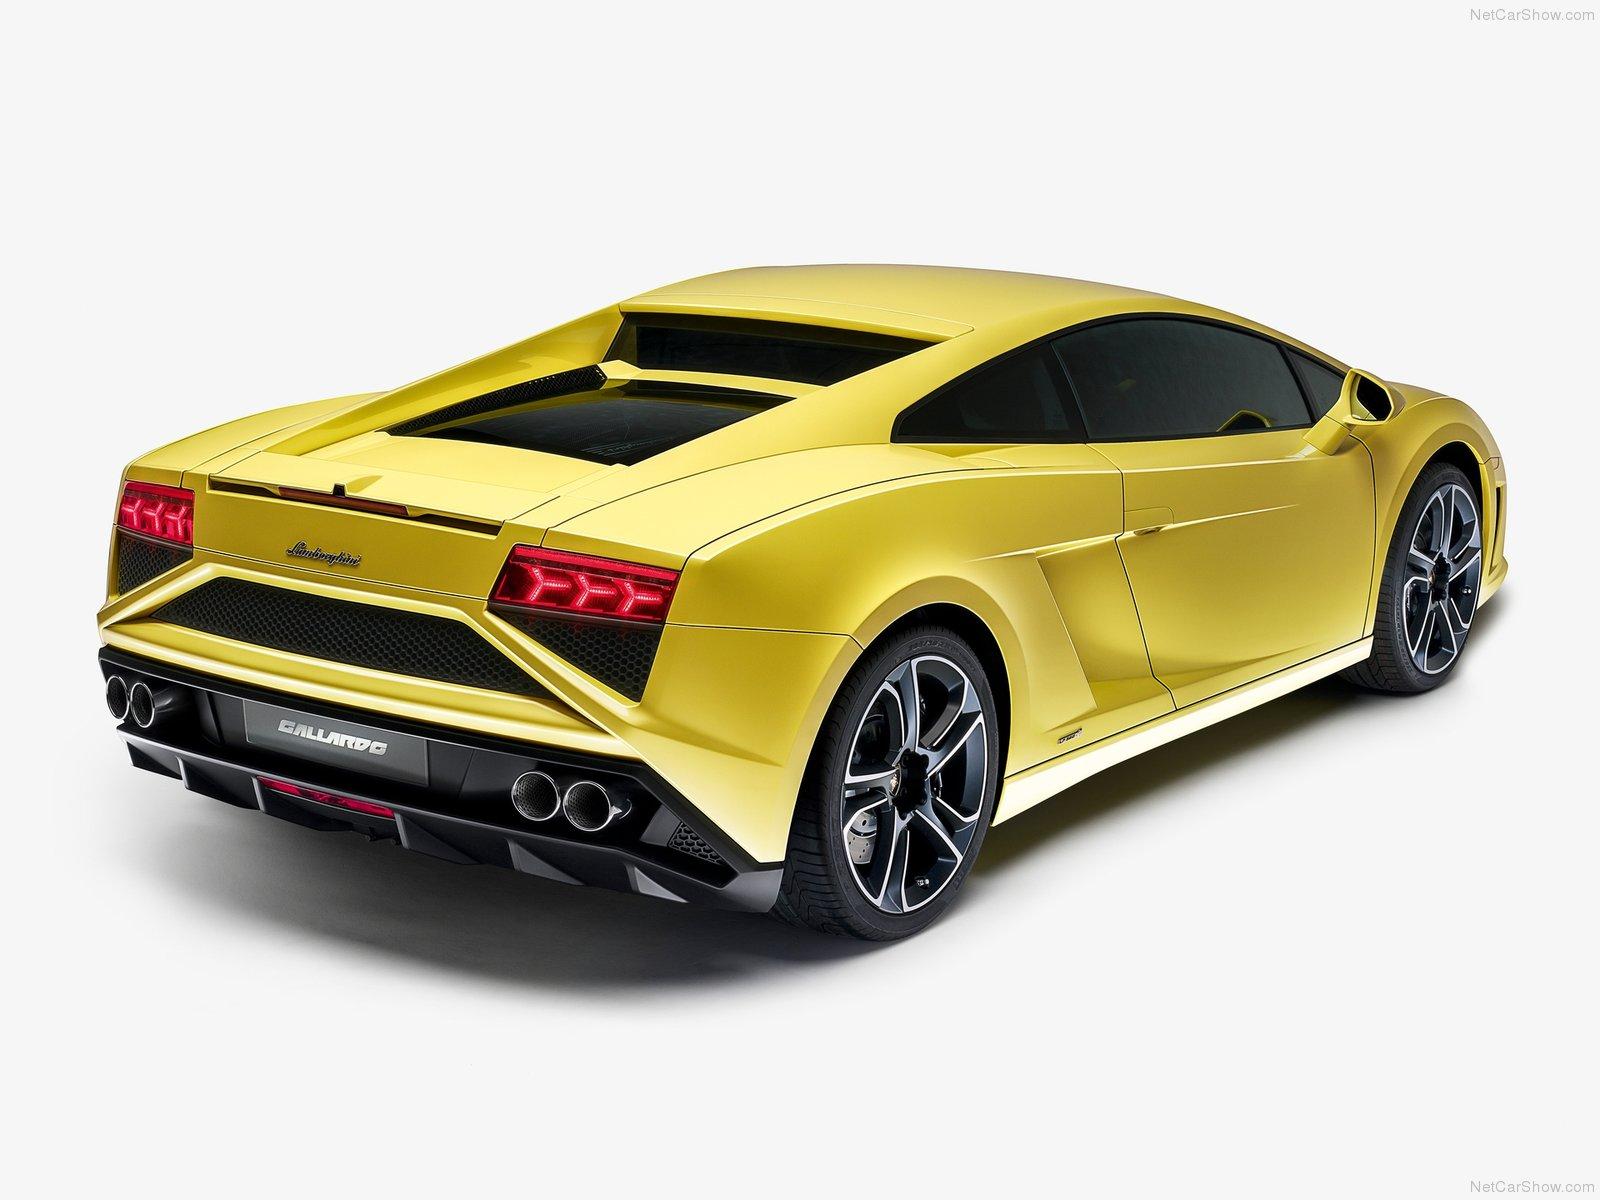 Hình ảnh siêu xe Lamborghini Gallardo LP560-4 2013 & nội ngoại thất